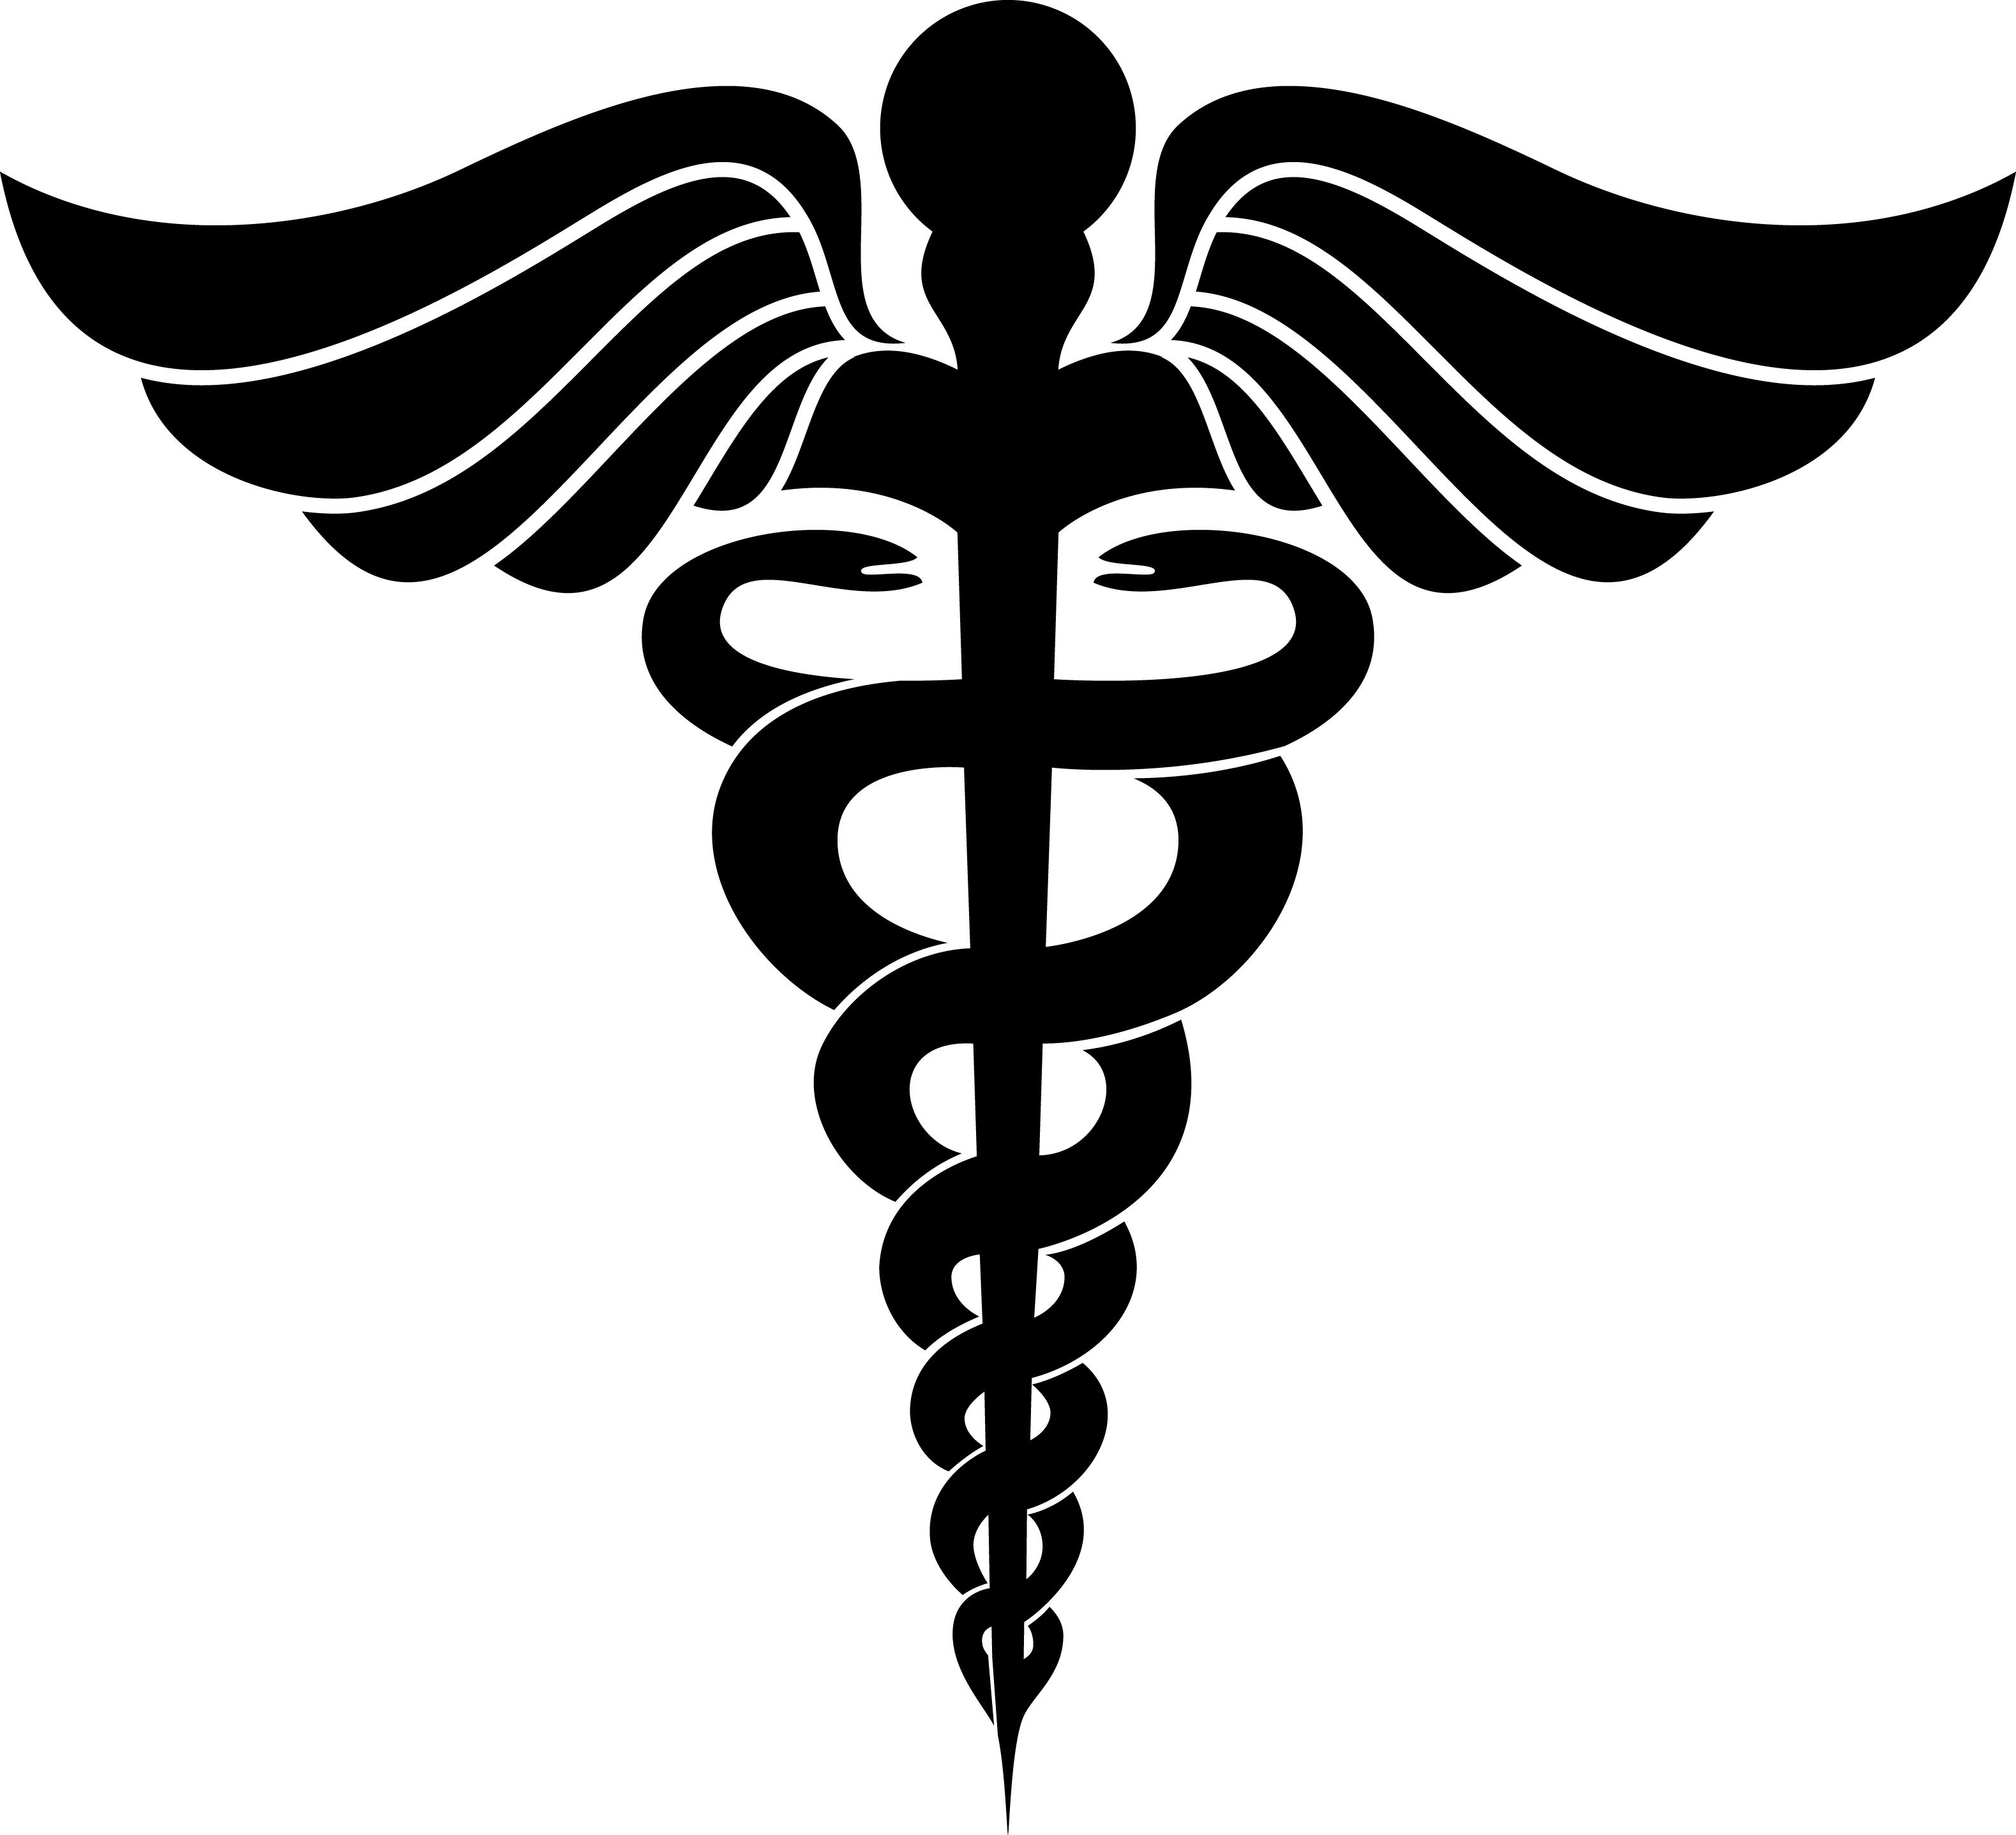 Clipart Medical Symbol .-Clipart Medical Symbol .-8